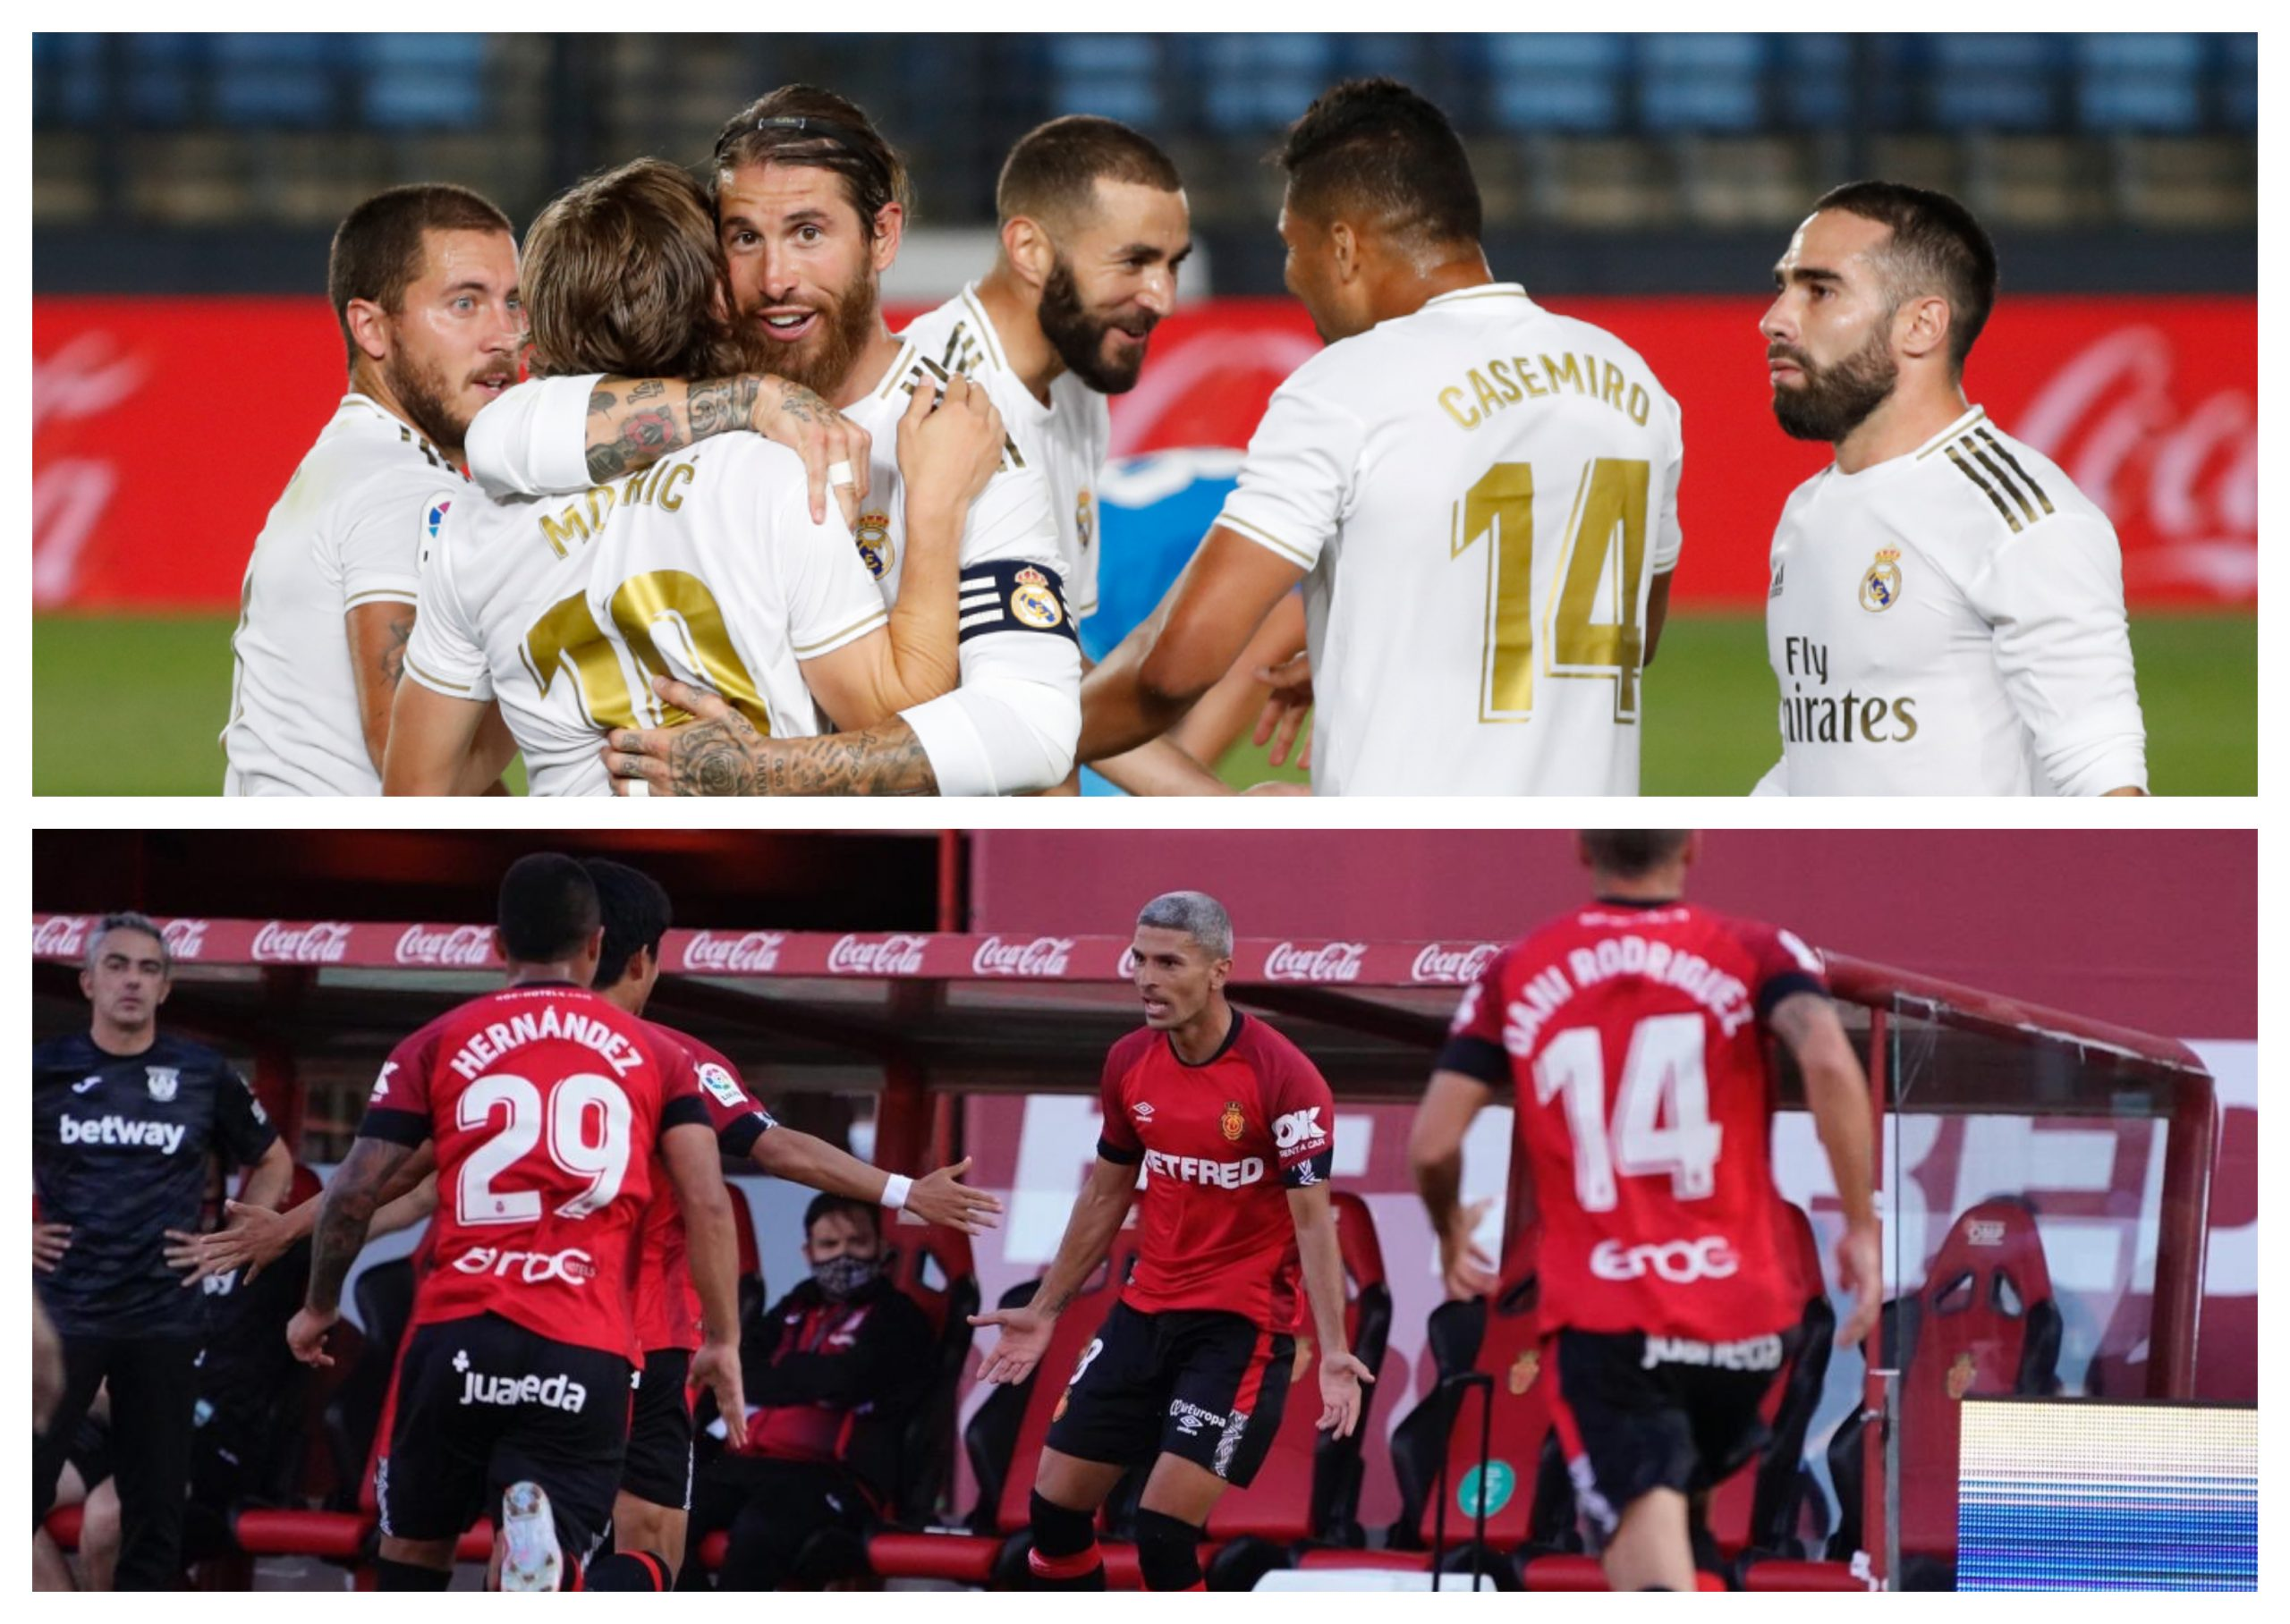 El Real Madrid recibe al Mallorca en un partido de la fecha 31 de la Liga Española, en el Estadio Alfredo Di Stéfano. (Foto: Twitter)